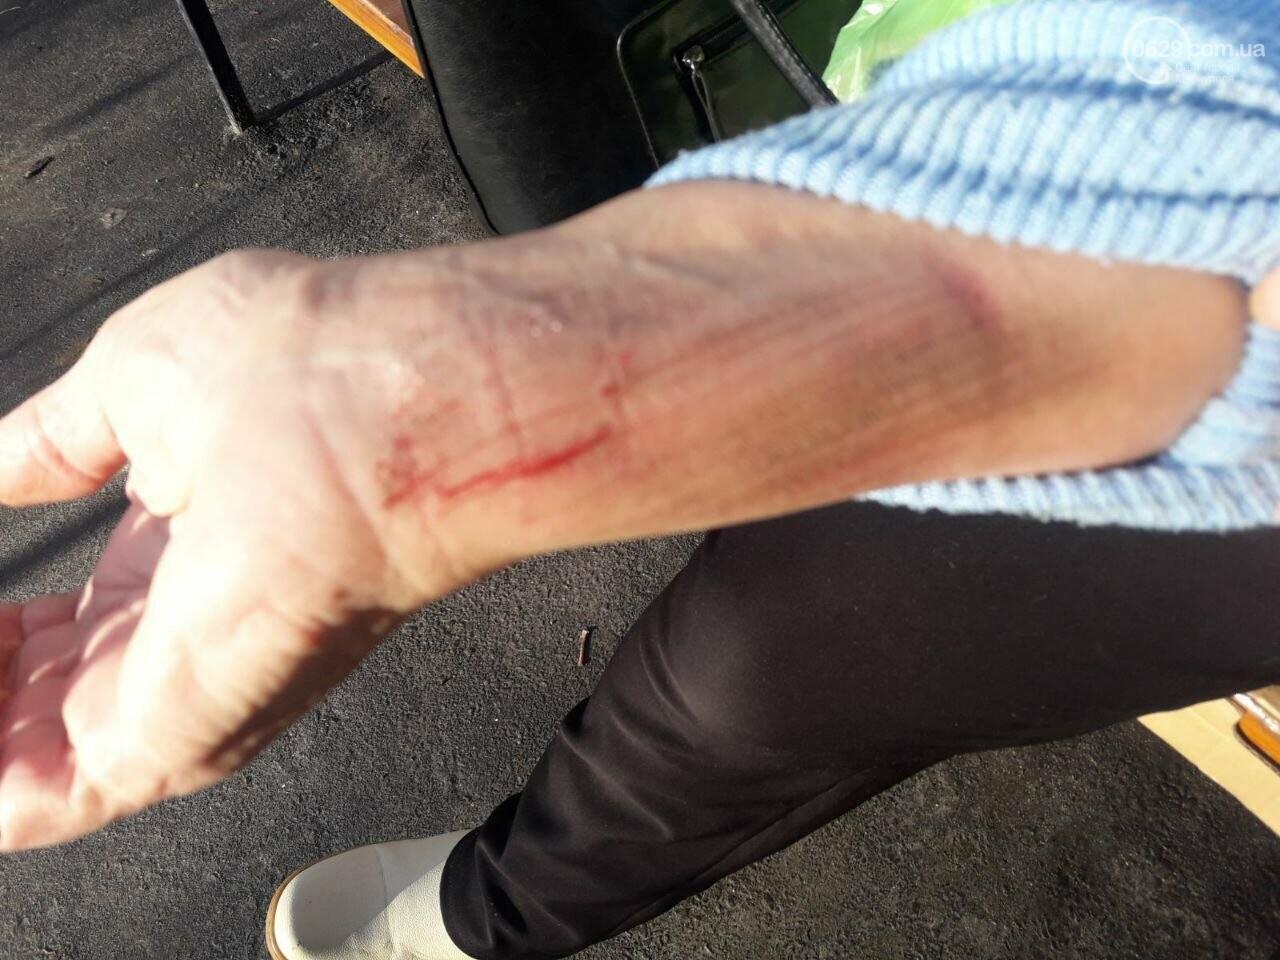 В Мариуполе пенсионерка кормила голубей и попала под колеса авто, - ФОТО, ВИДЕО, фото-3